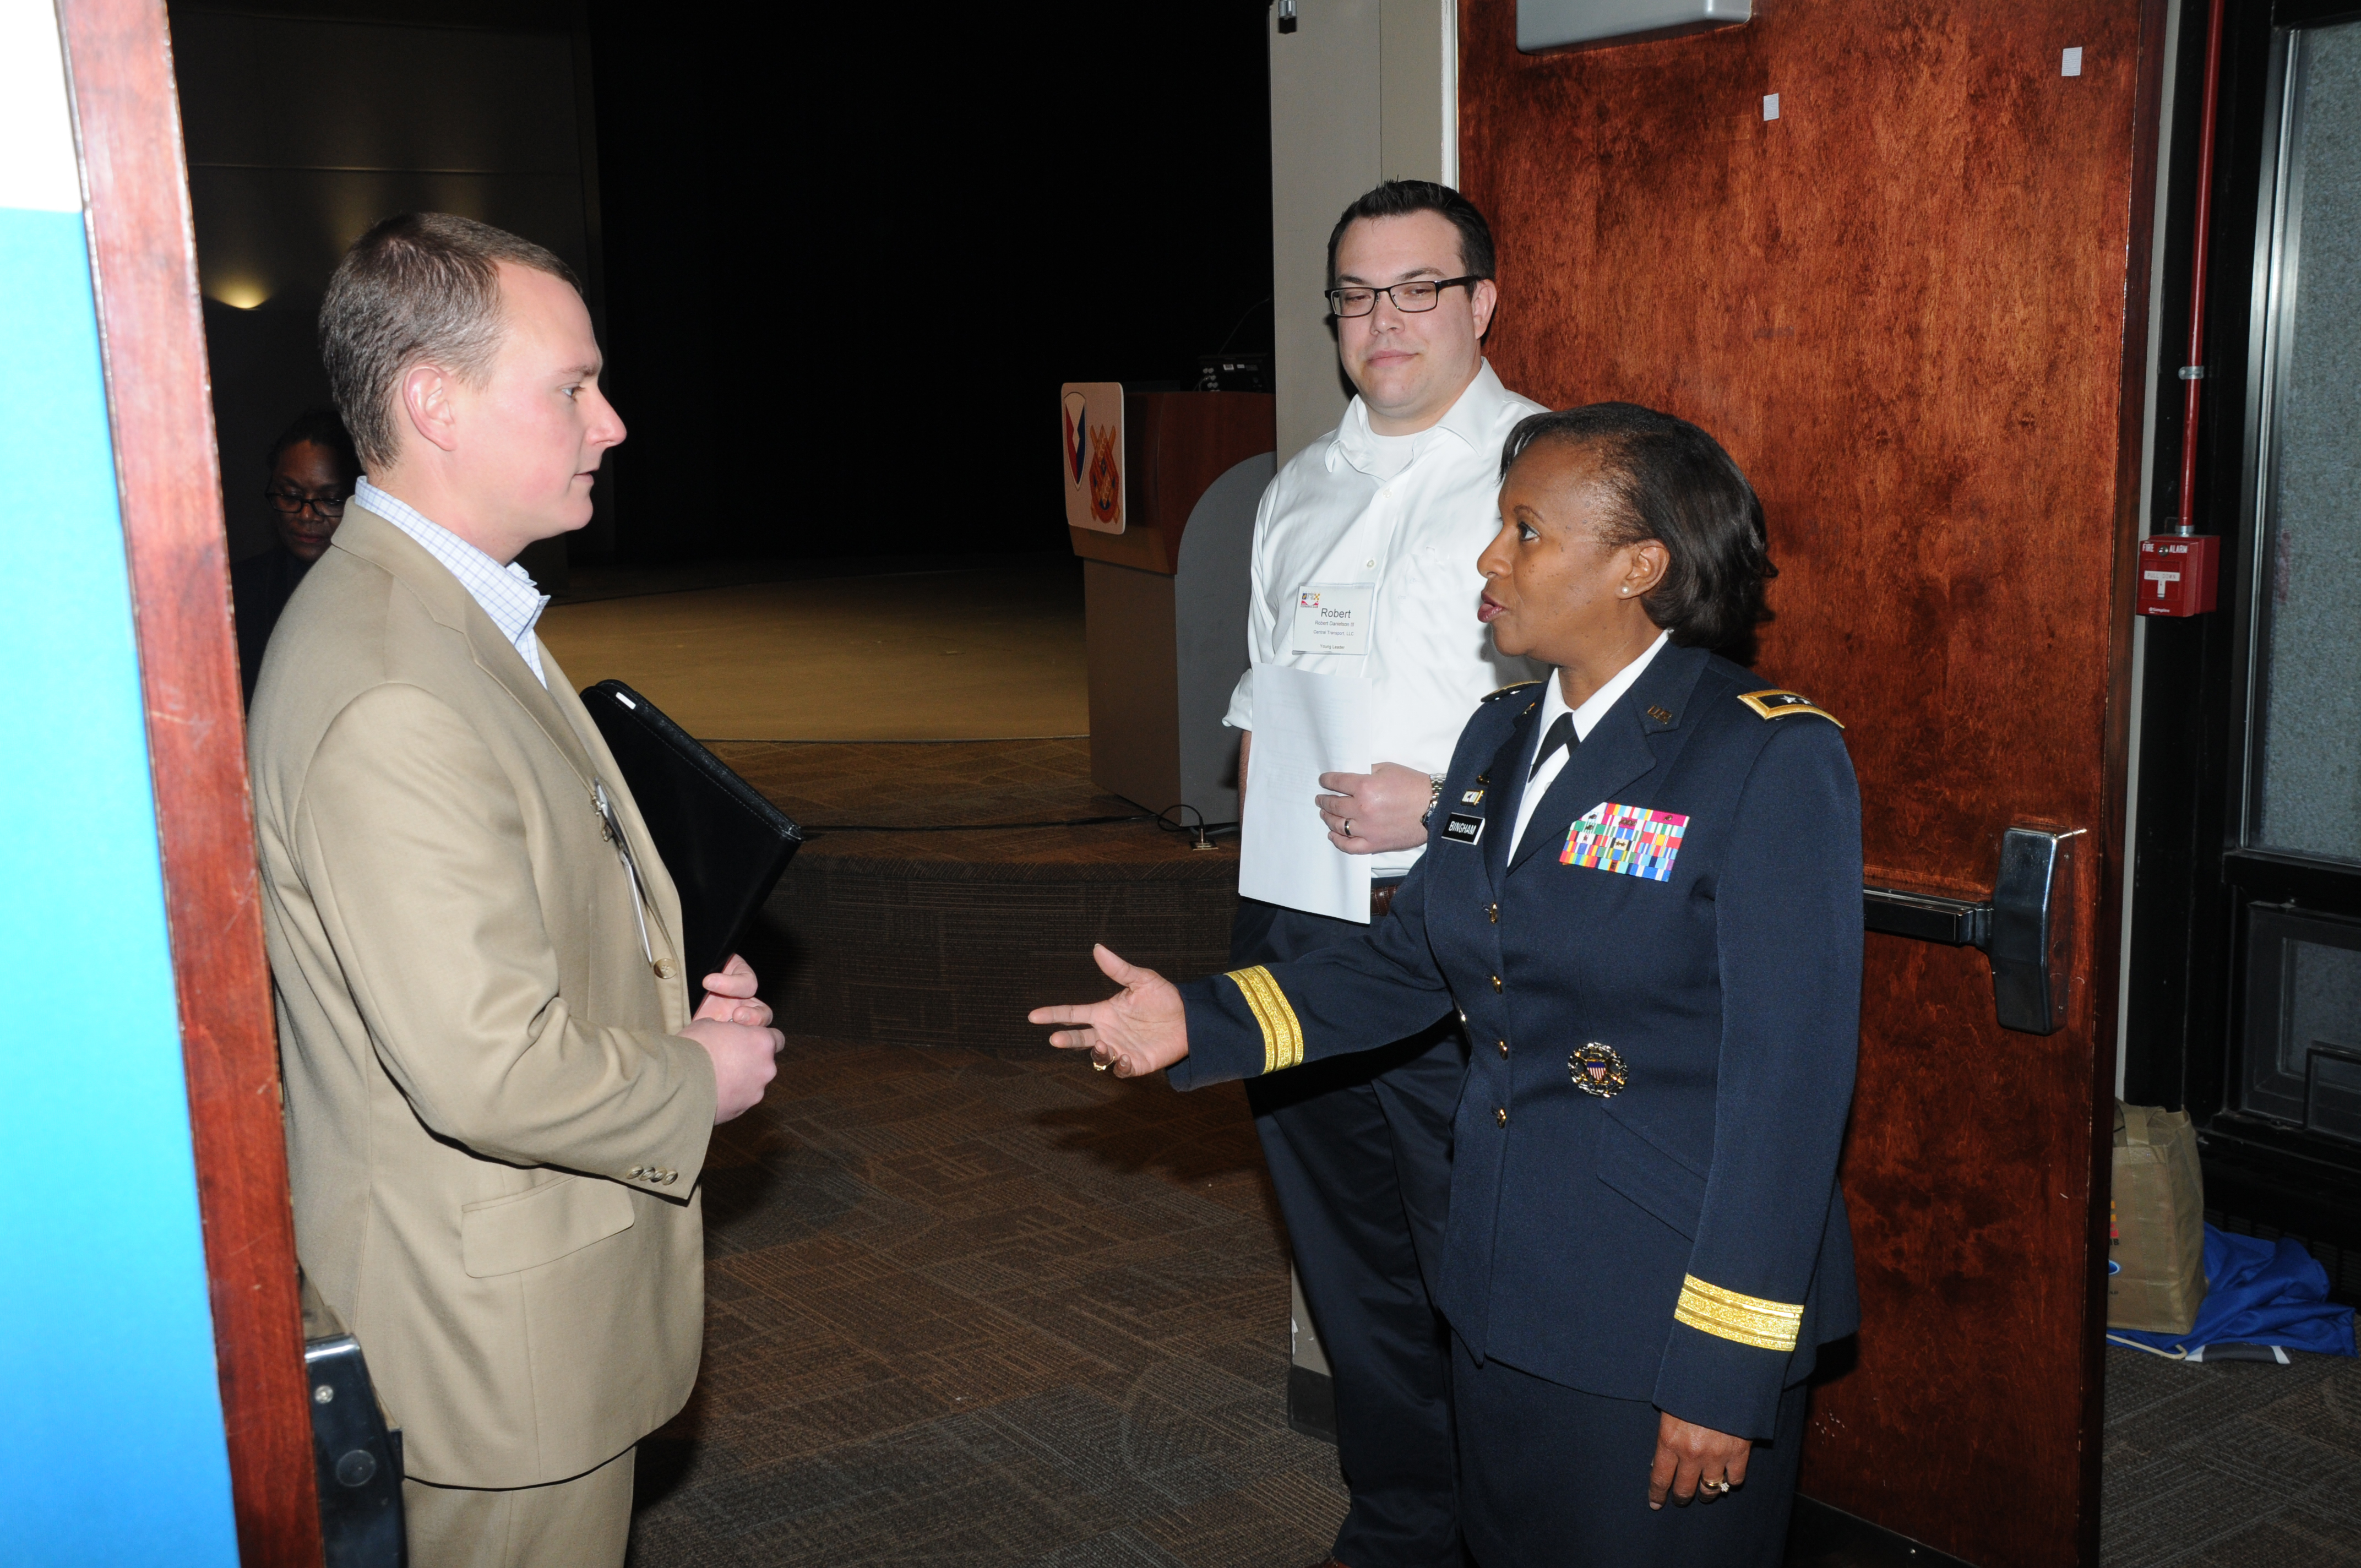 Dec Young Leader Series Major General Gwen Bingham